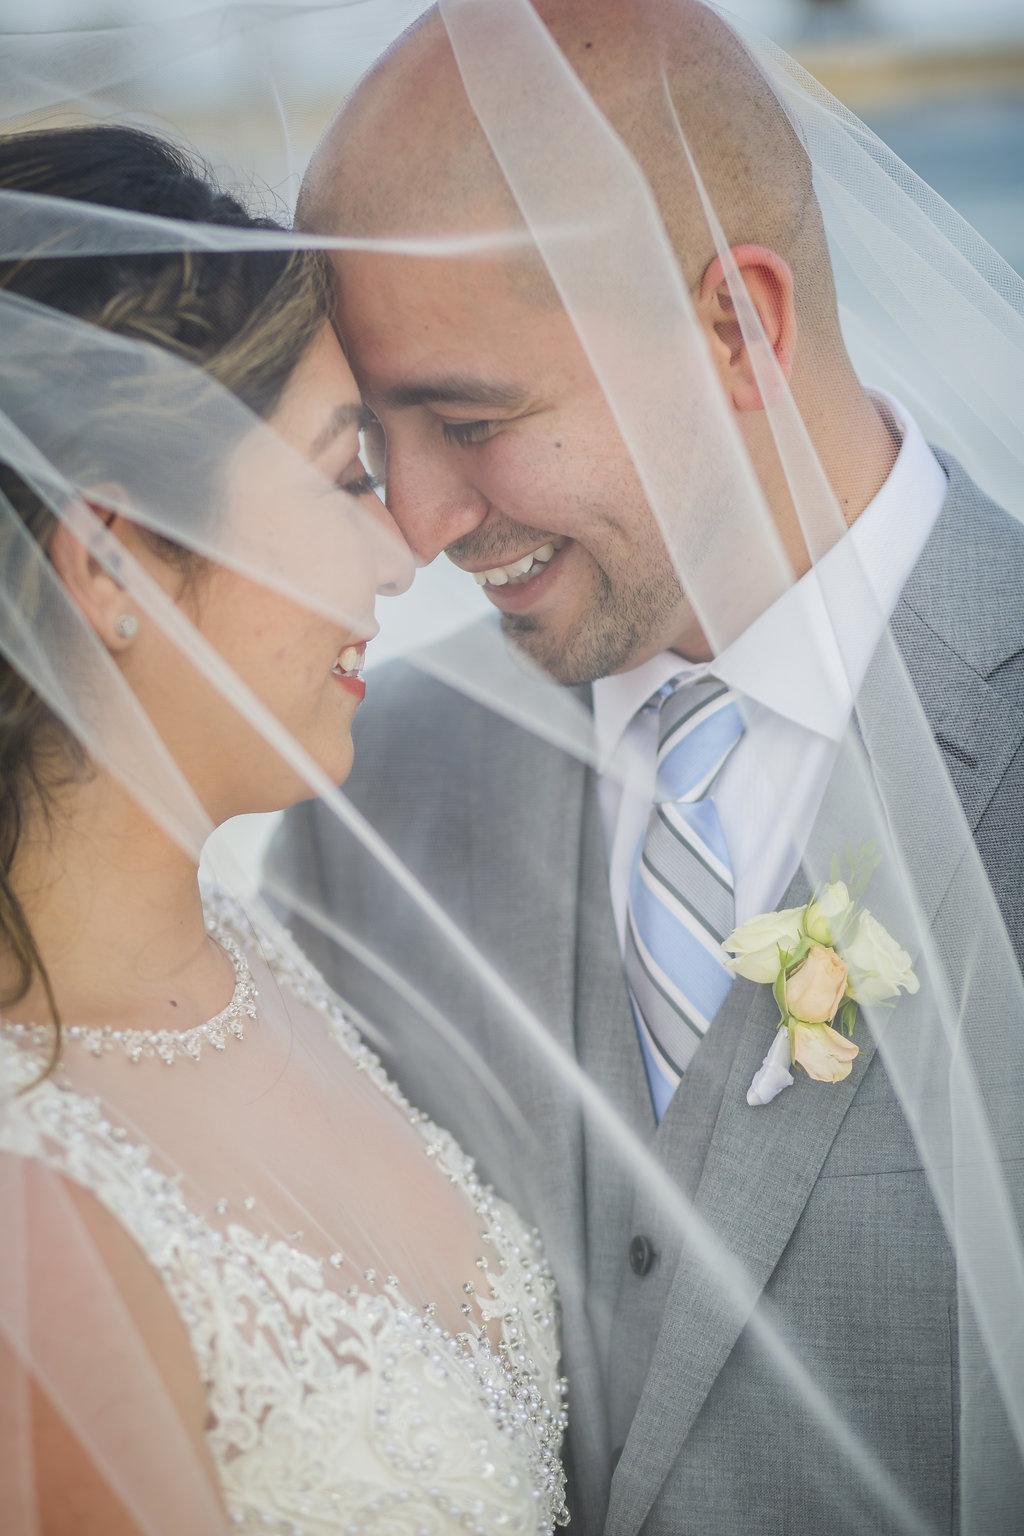 yesica-jose-beach-wedding-Villa-La-Joya--Playa-del-carmen-01--25.jpg